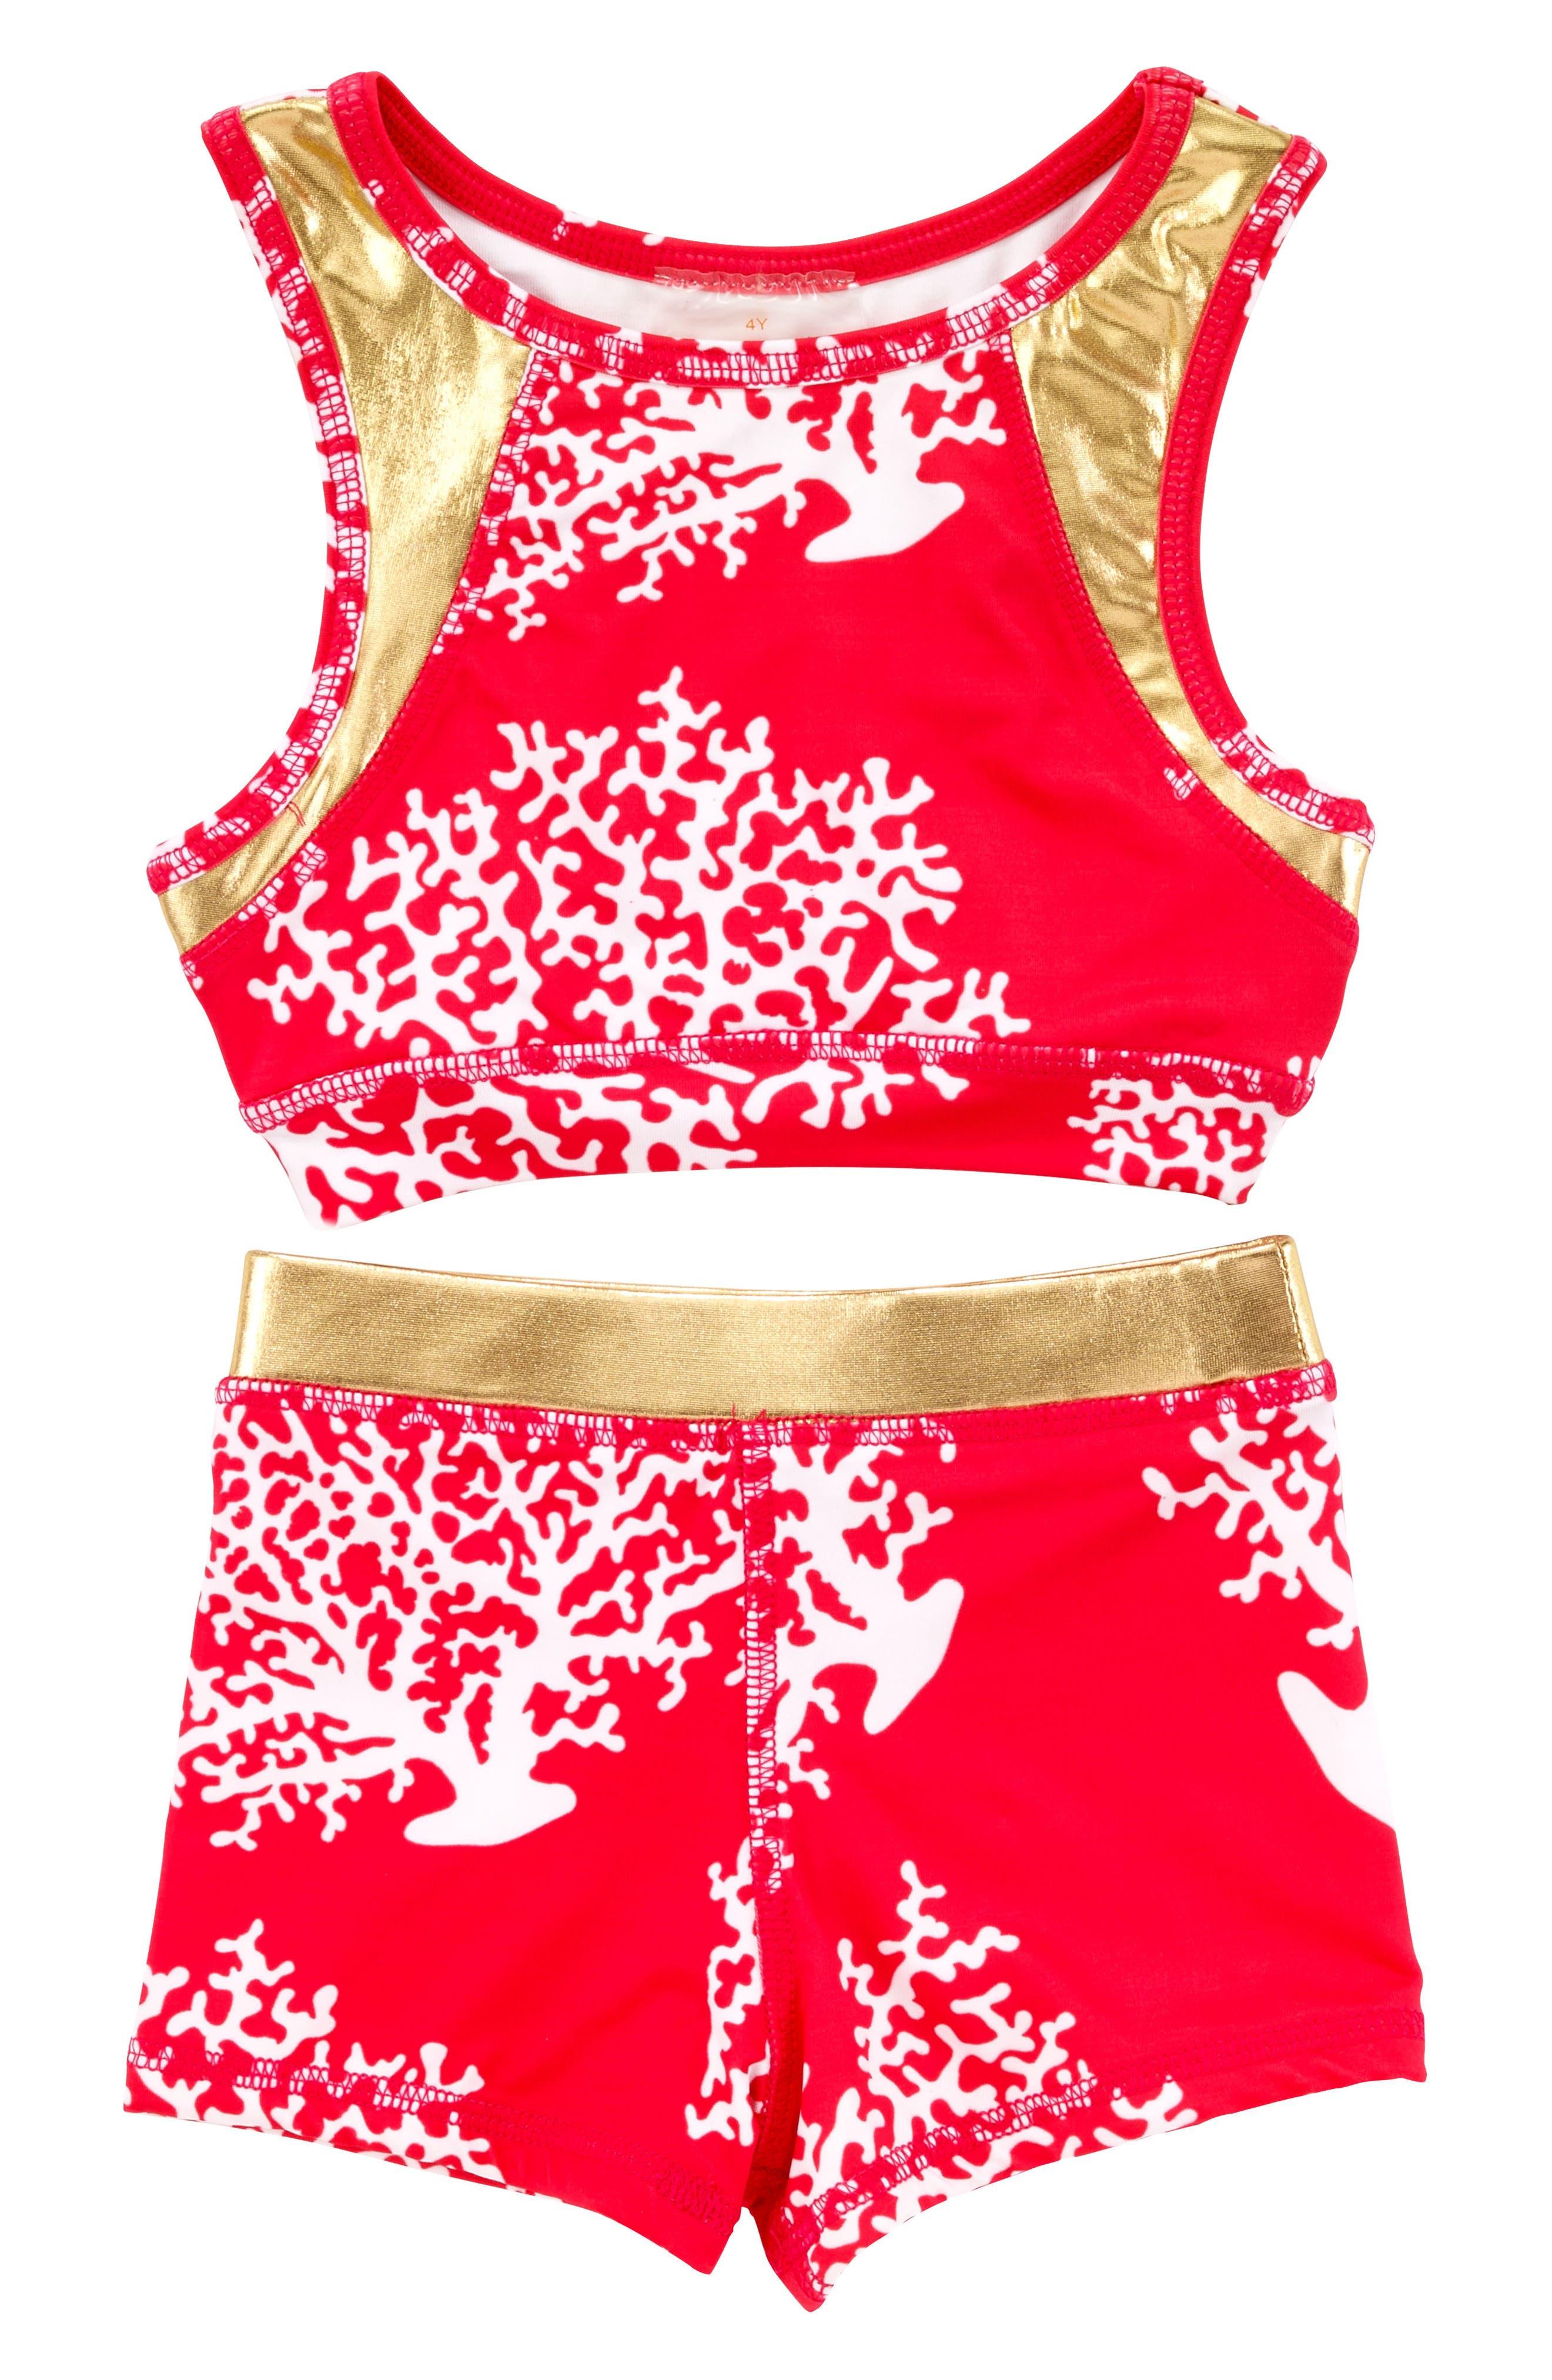 Alternate Image 1 Selected - Masala Baby Racerback Two-Piece Swimsuit (Toddler Girls, Little Girls & Big Girls)